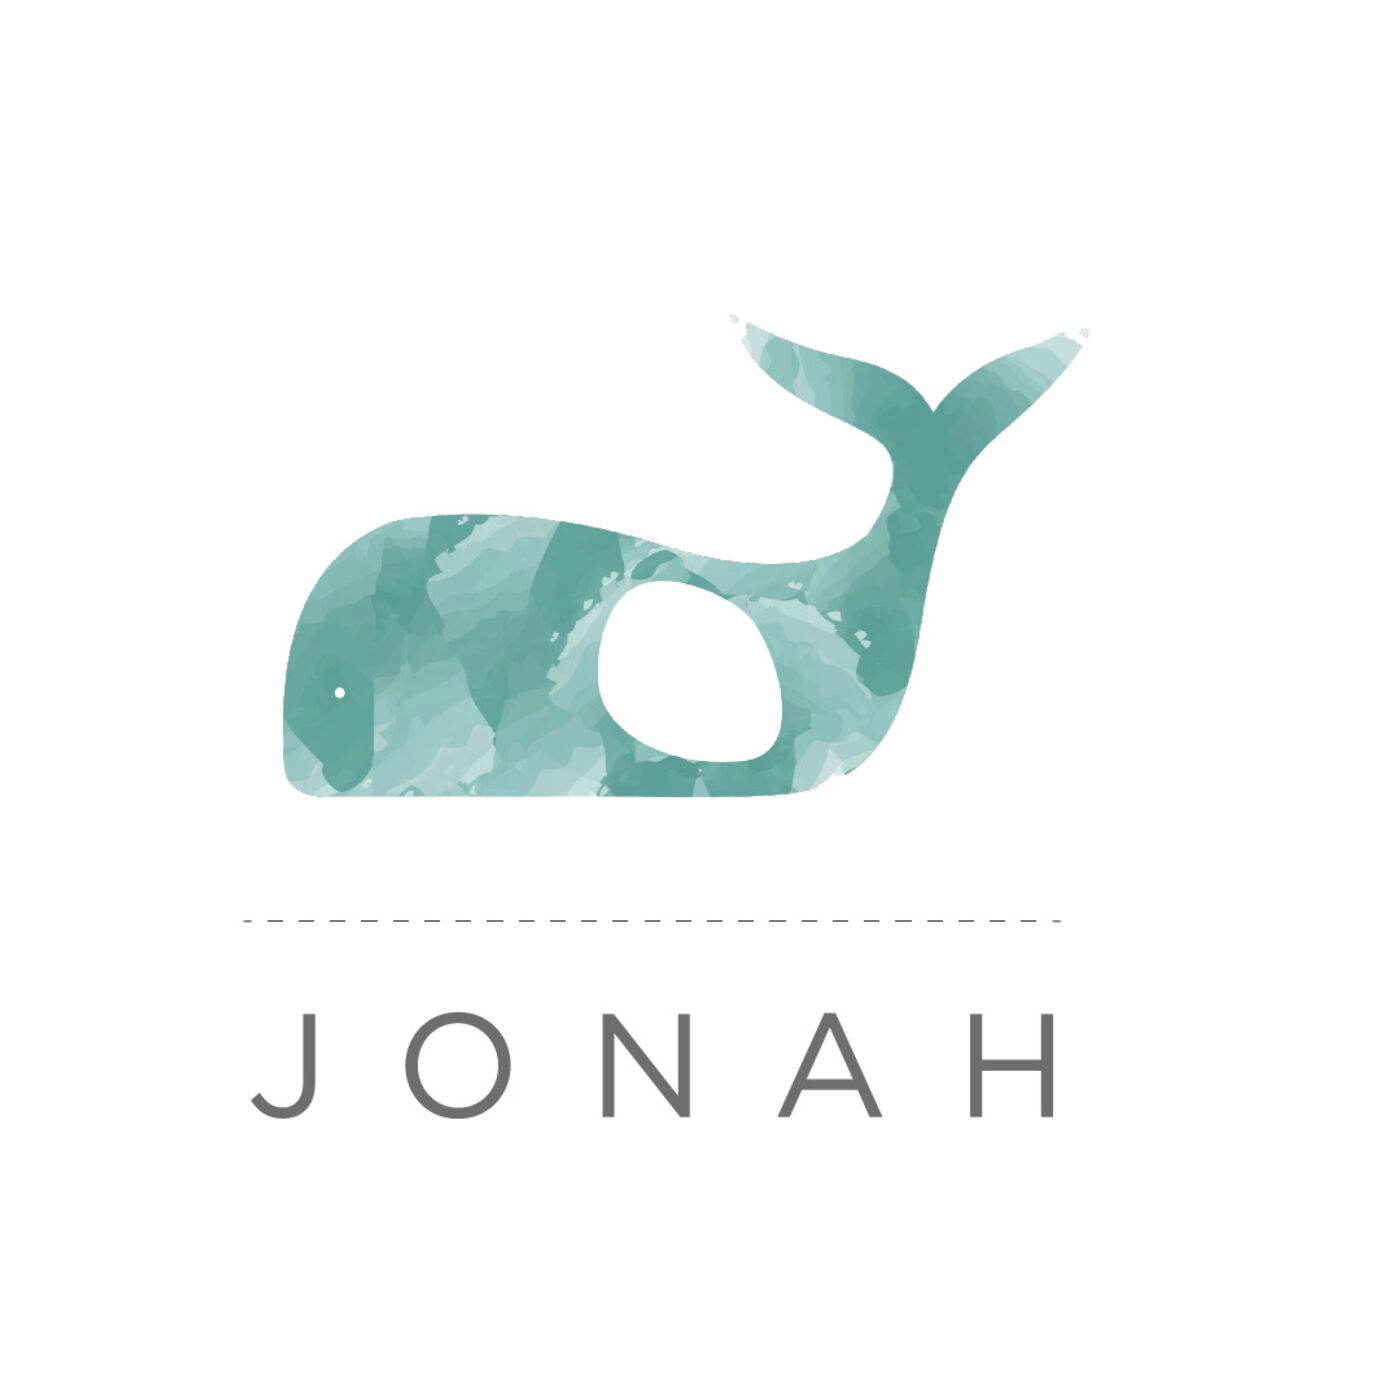 Symbols of Transformation (Jonah, Part II)